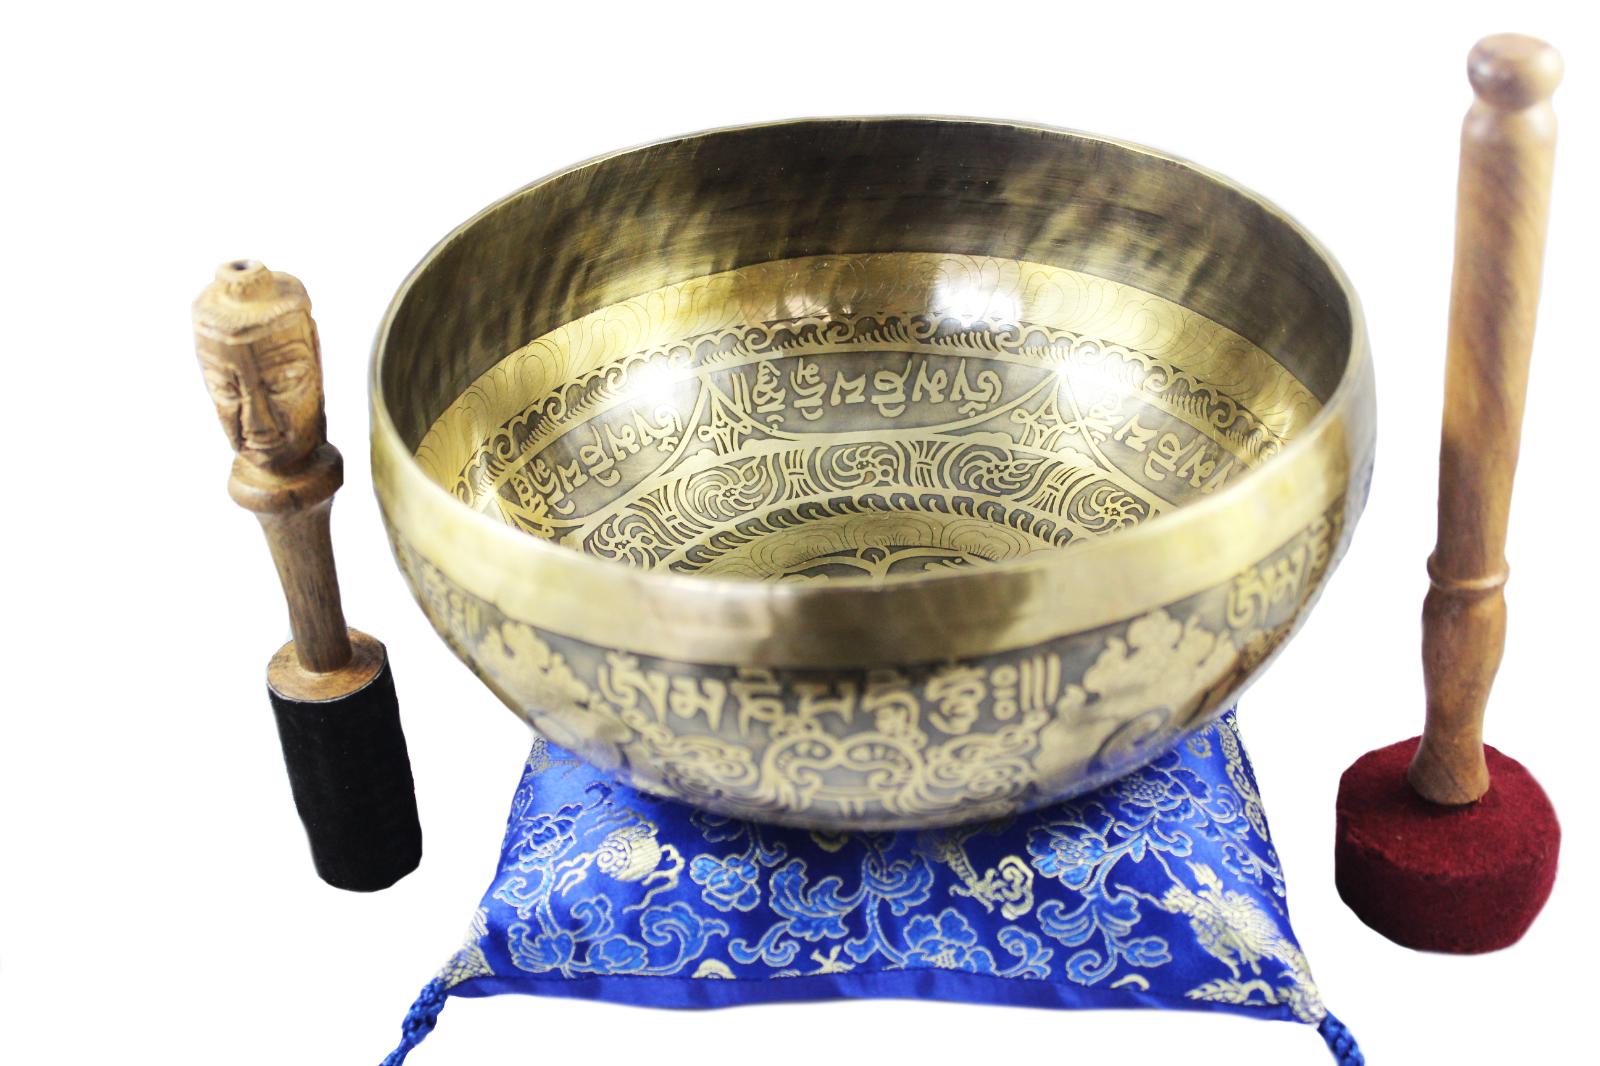 9 Om Mandala TibetanSinging Bowl SetPromotes PeaceChakra HealingMindfulness